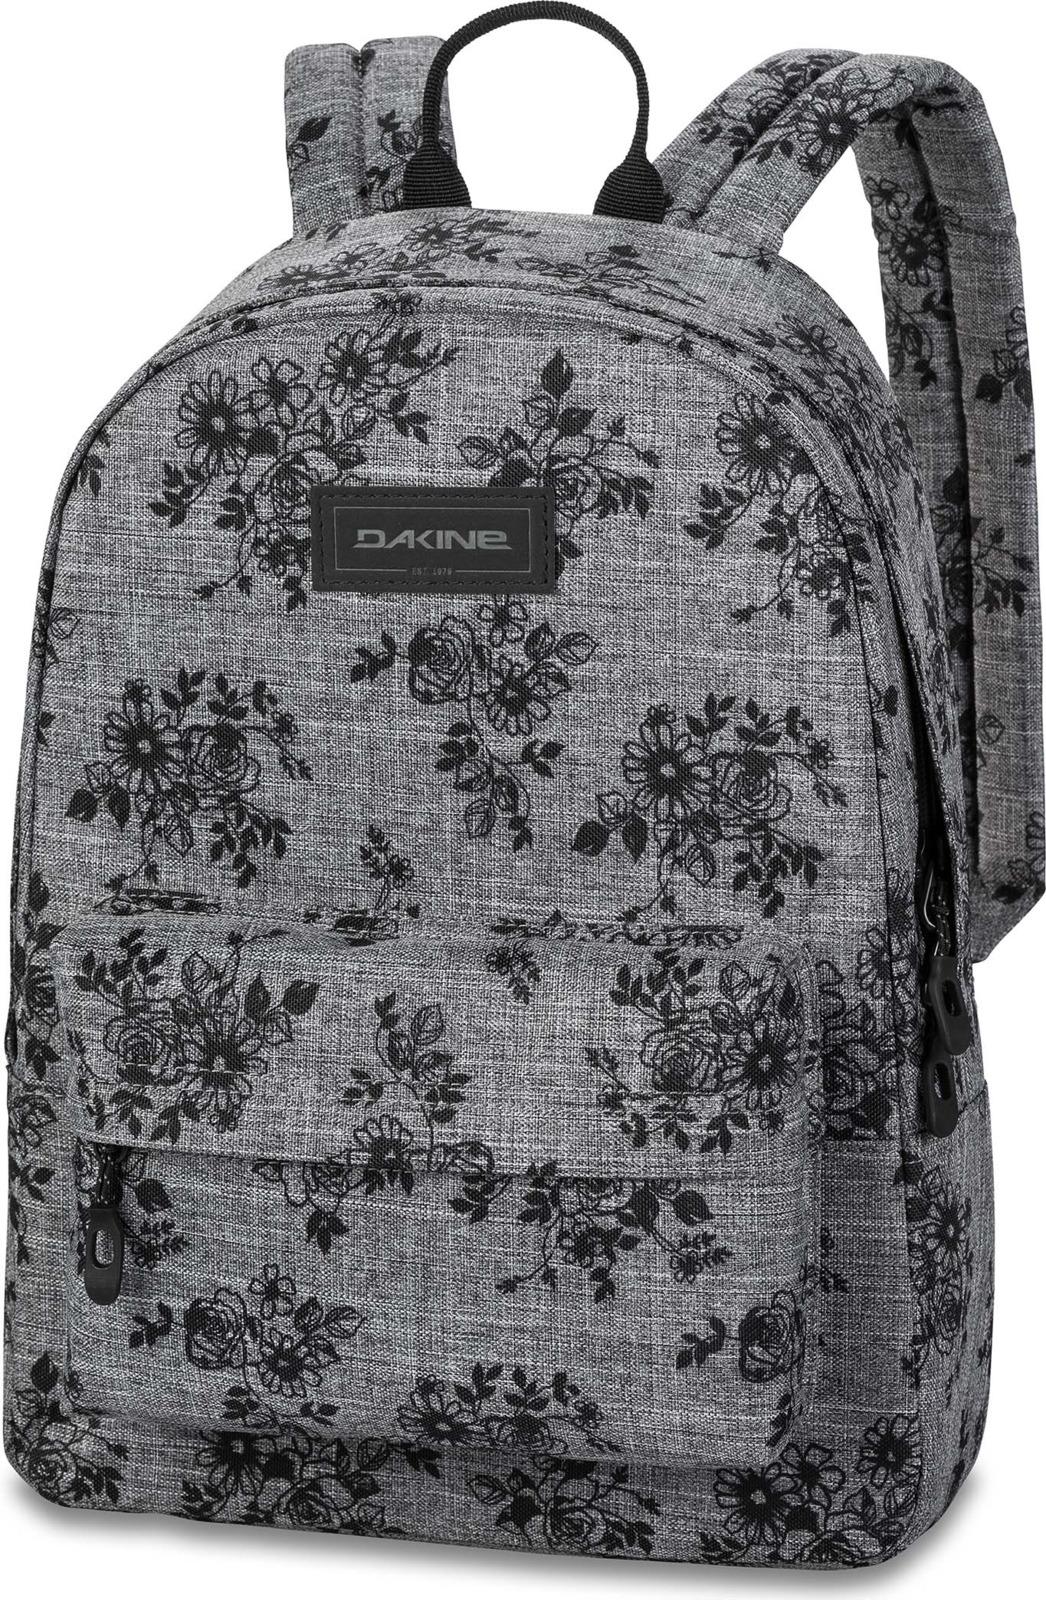 Рюкзак Dakine 365 Mini, цвет: серый, 12 л